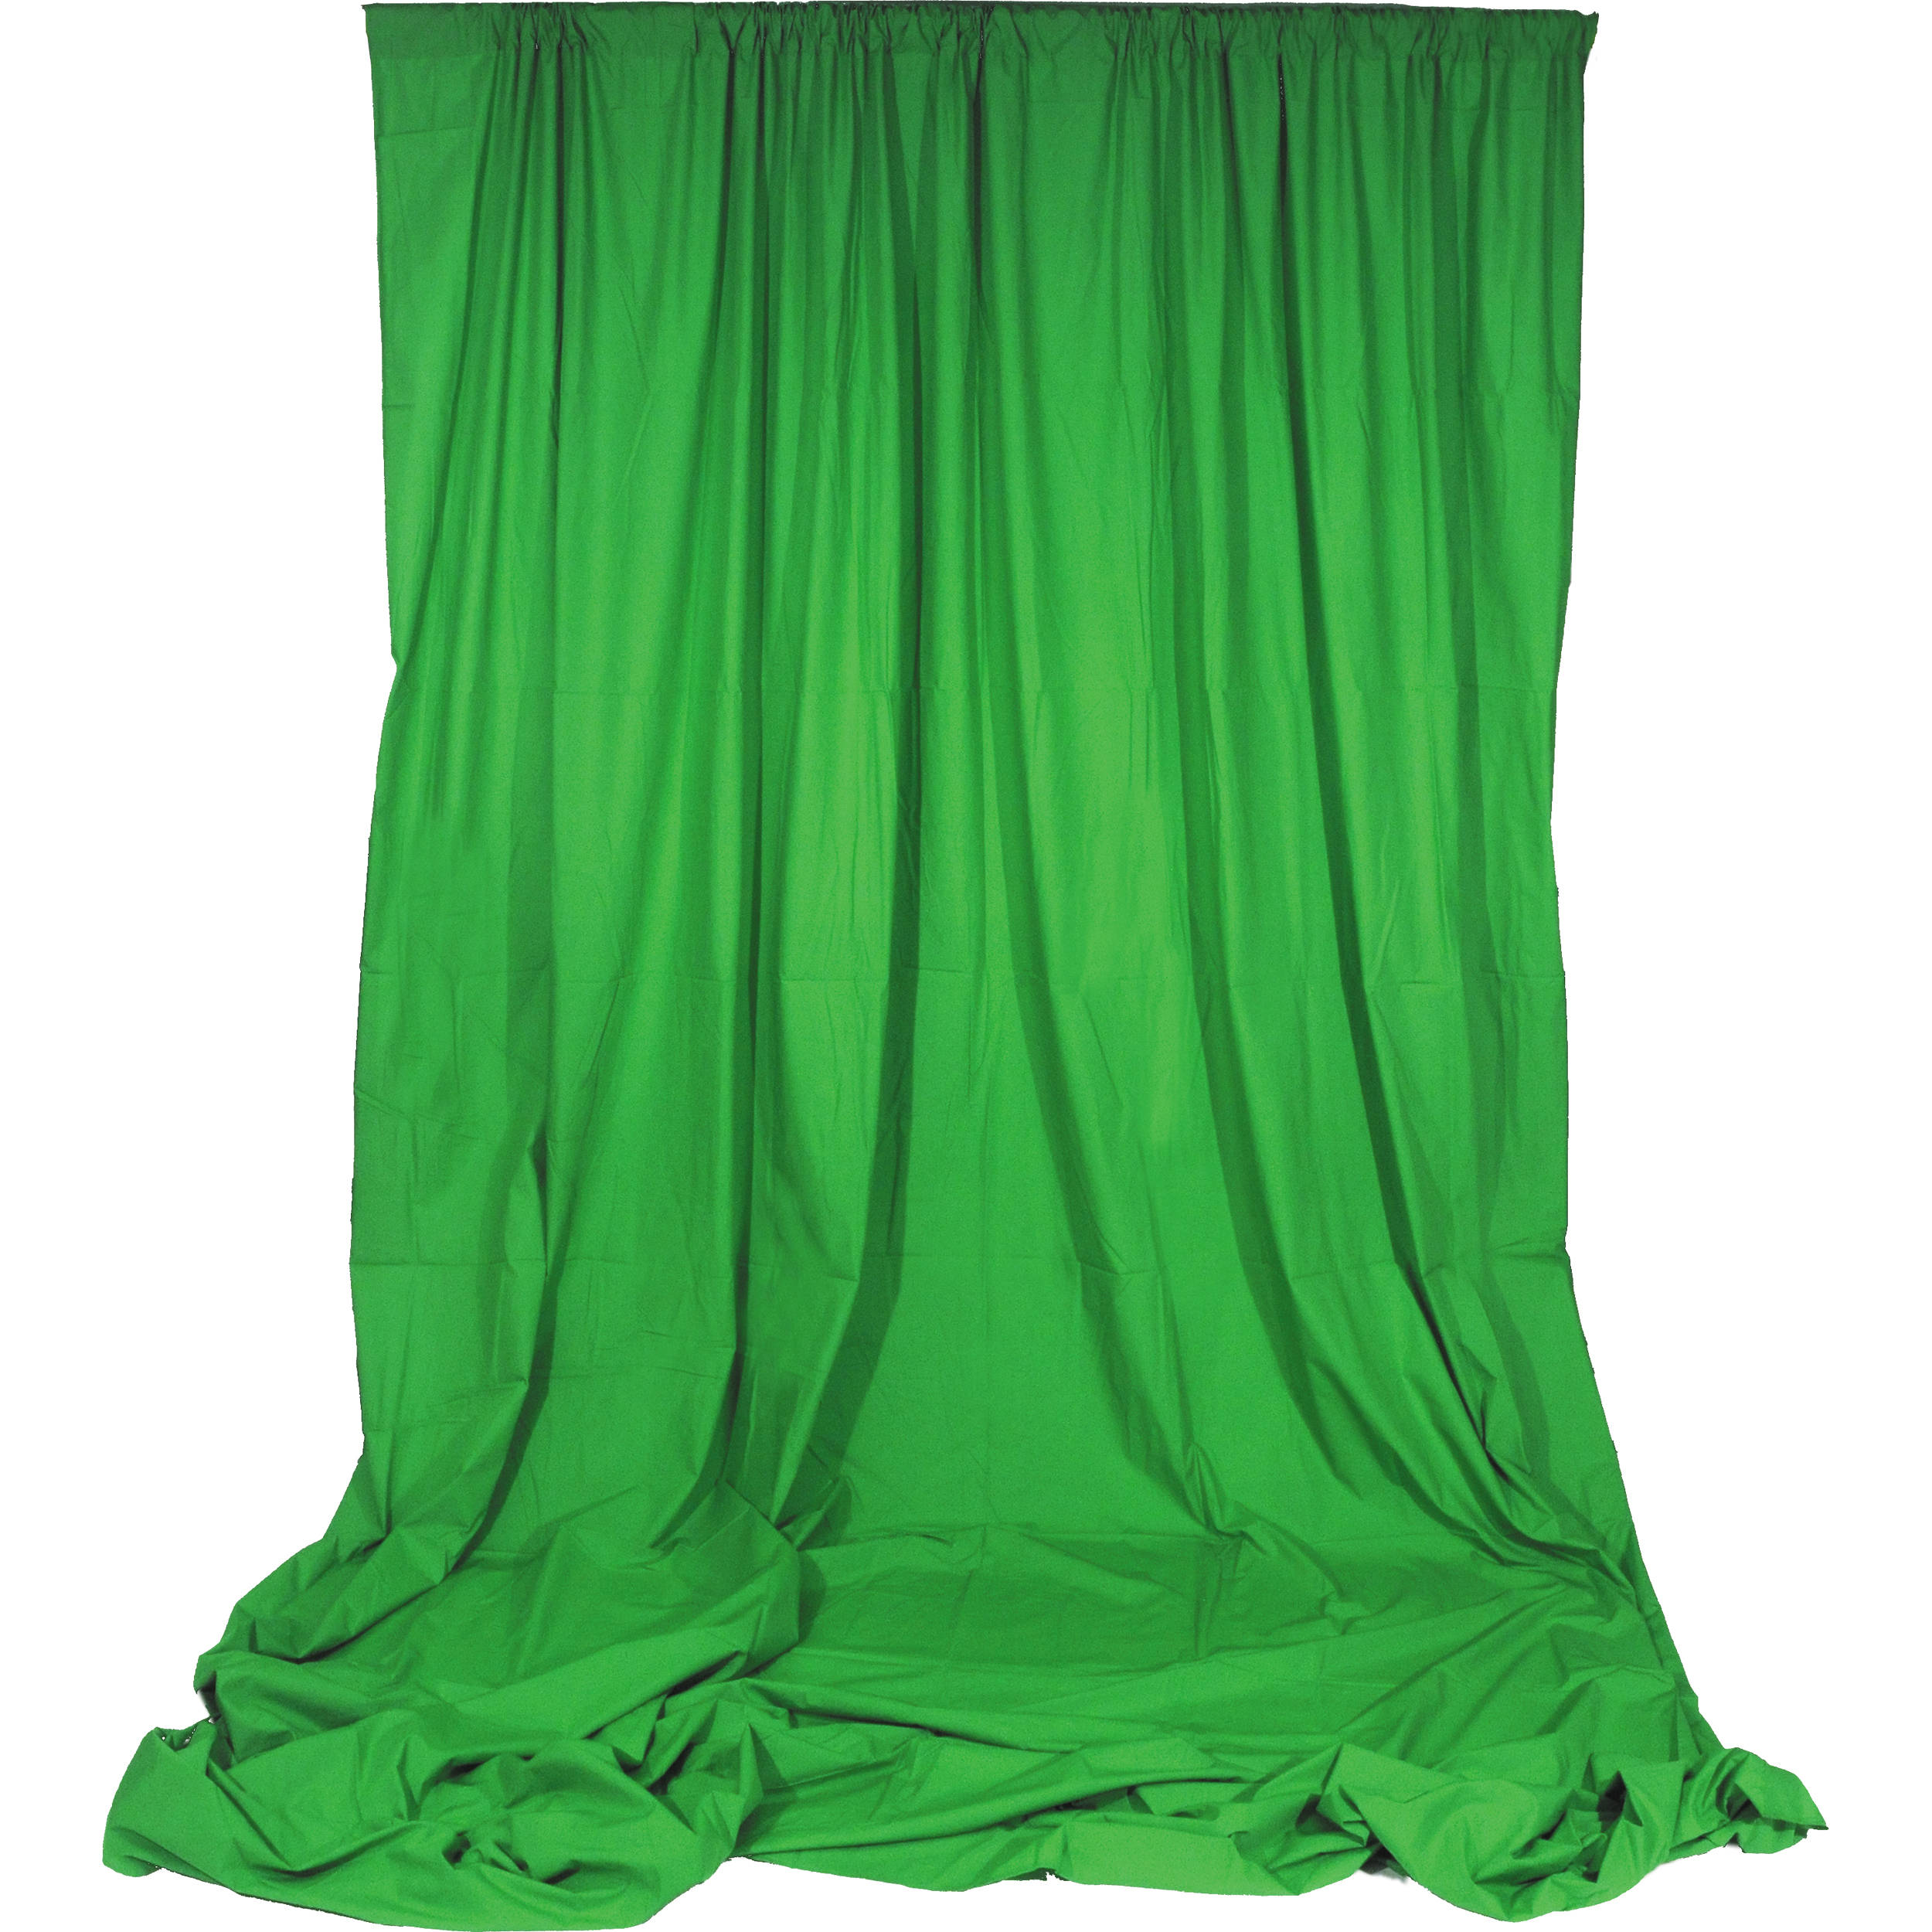 angler chromakey green background 10 x 12